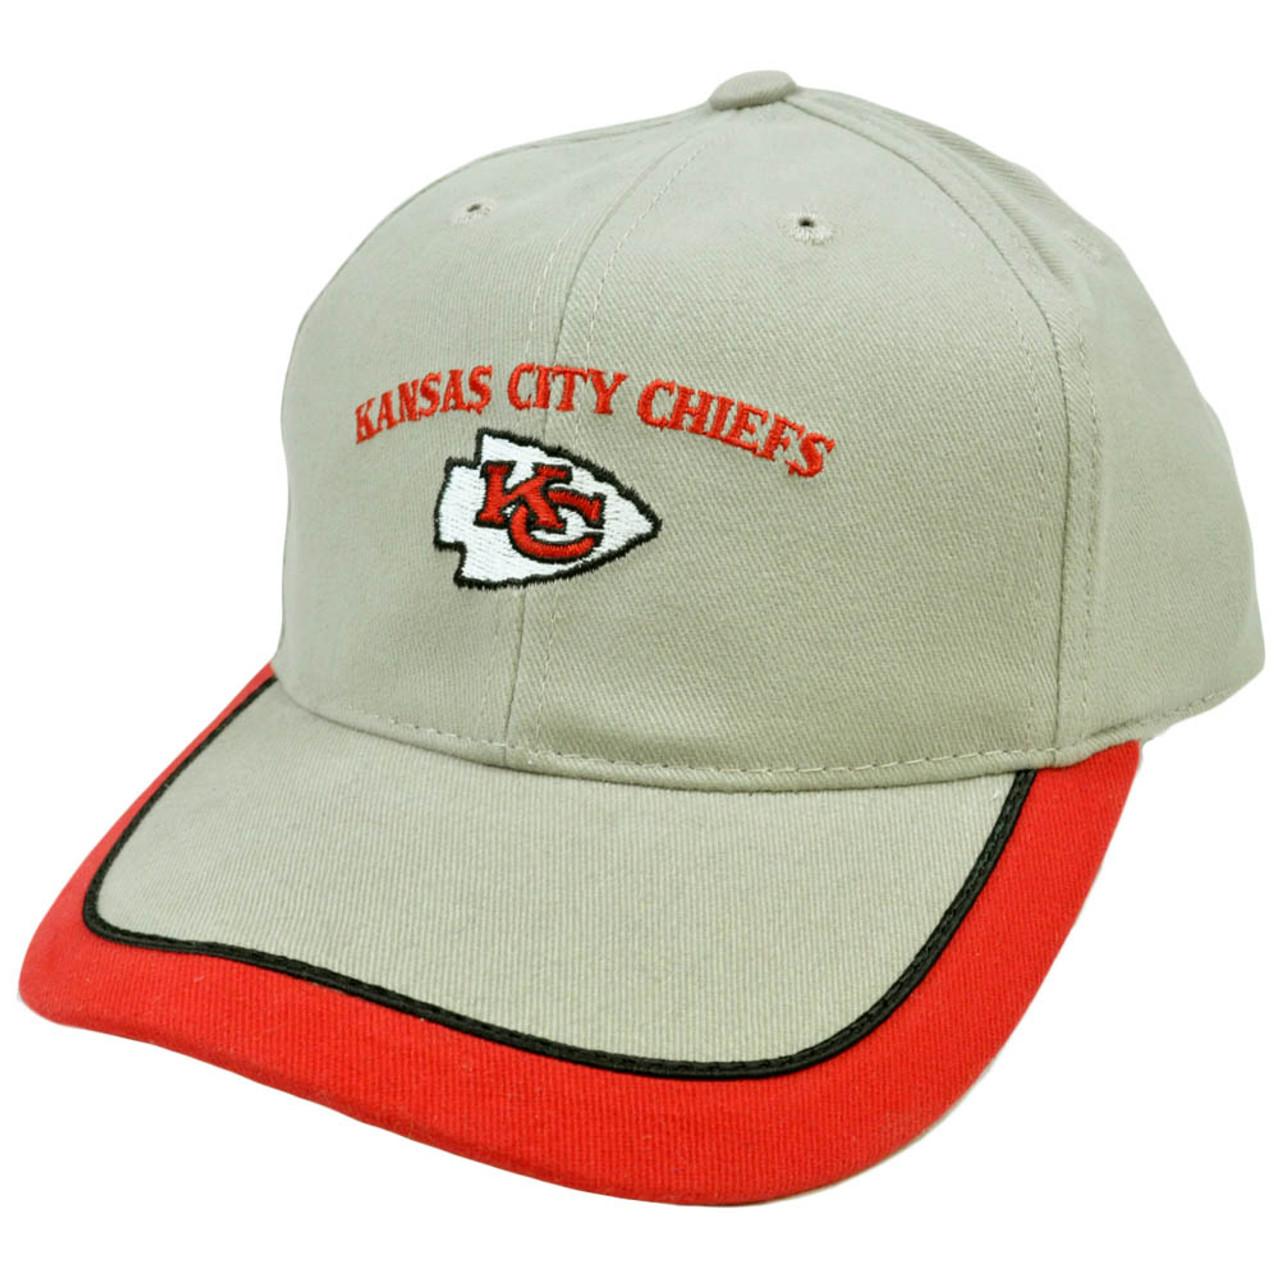 daea4574fb7ec NFL Kansas City Chiefs Old School Retro Vintage Snapback Licensed Annco Hat  Cap - Cap Store Online.com